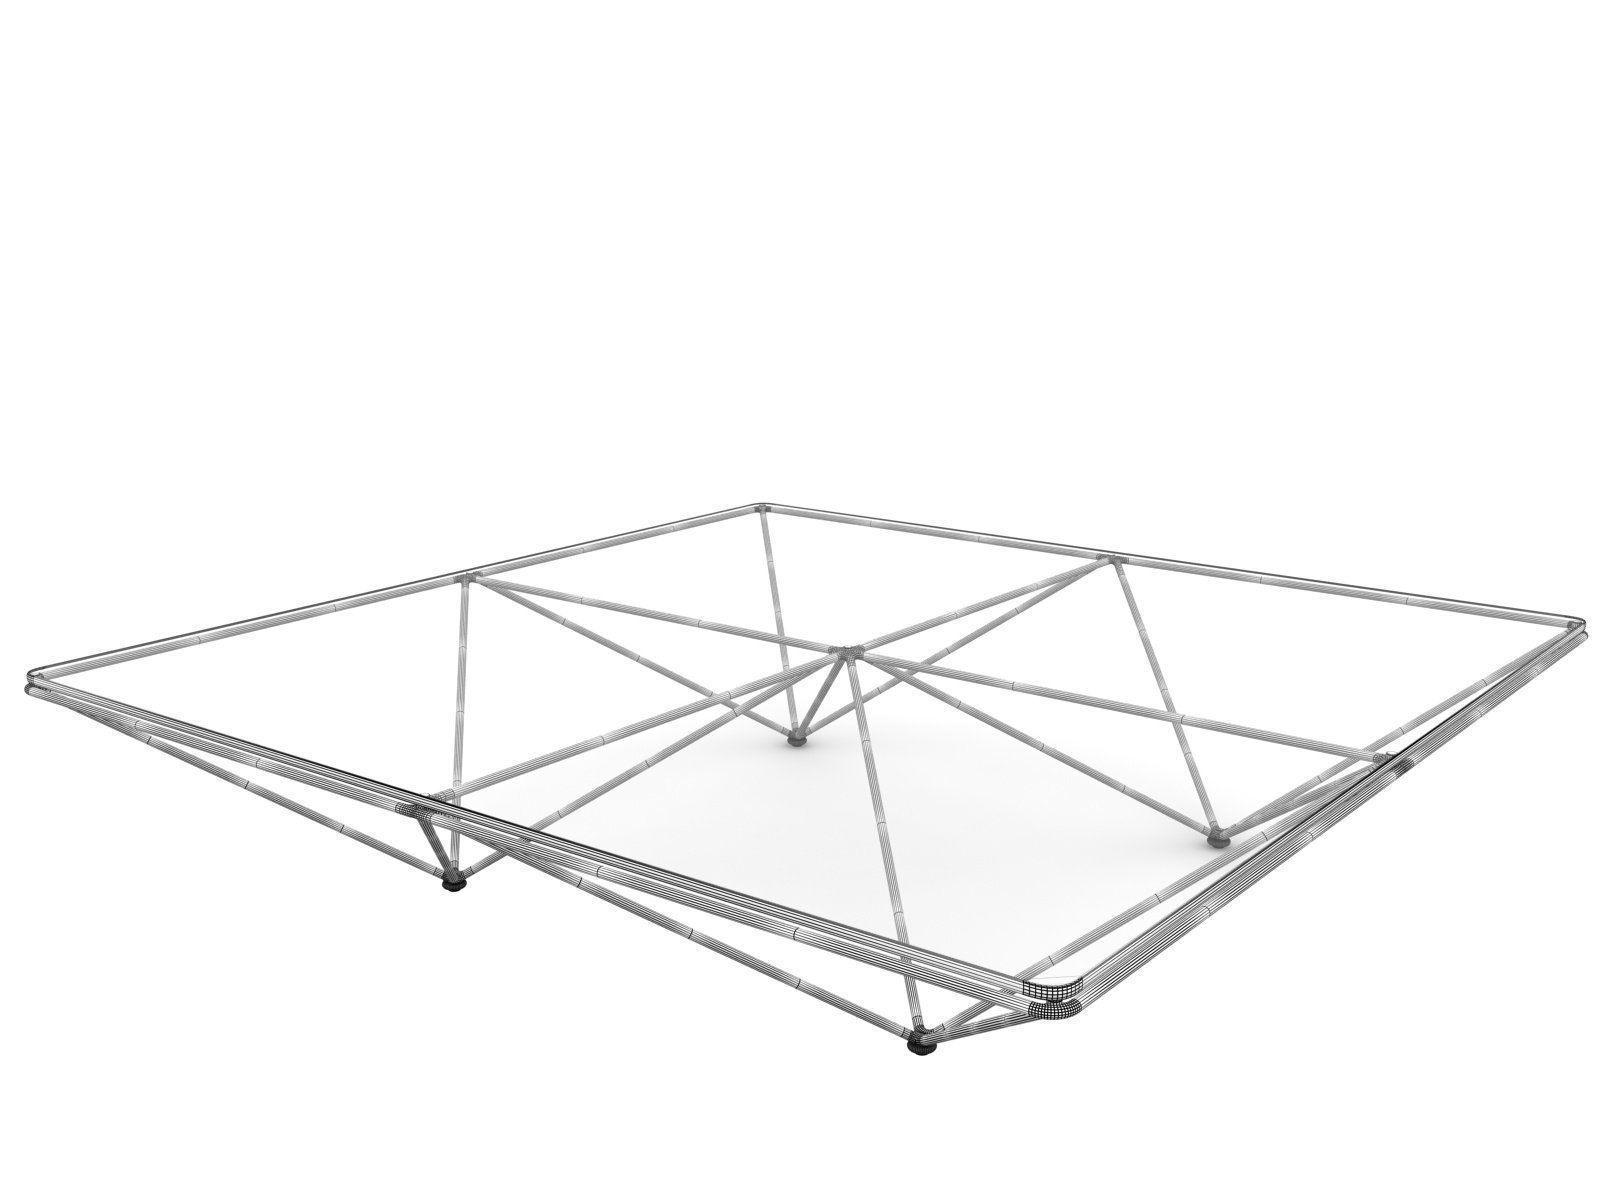 1600x1200 3d Alanda Coffee Table Cgtrader